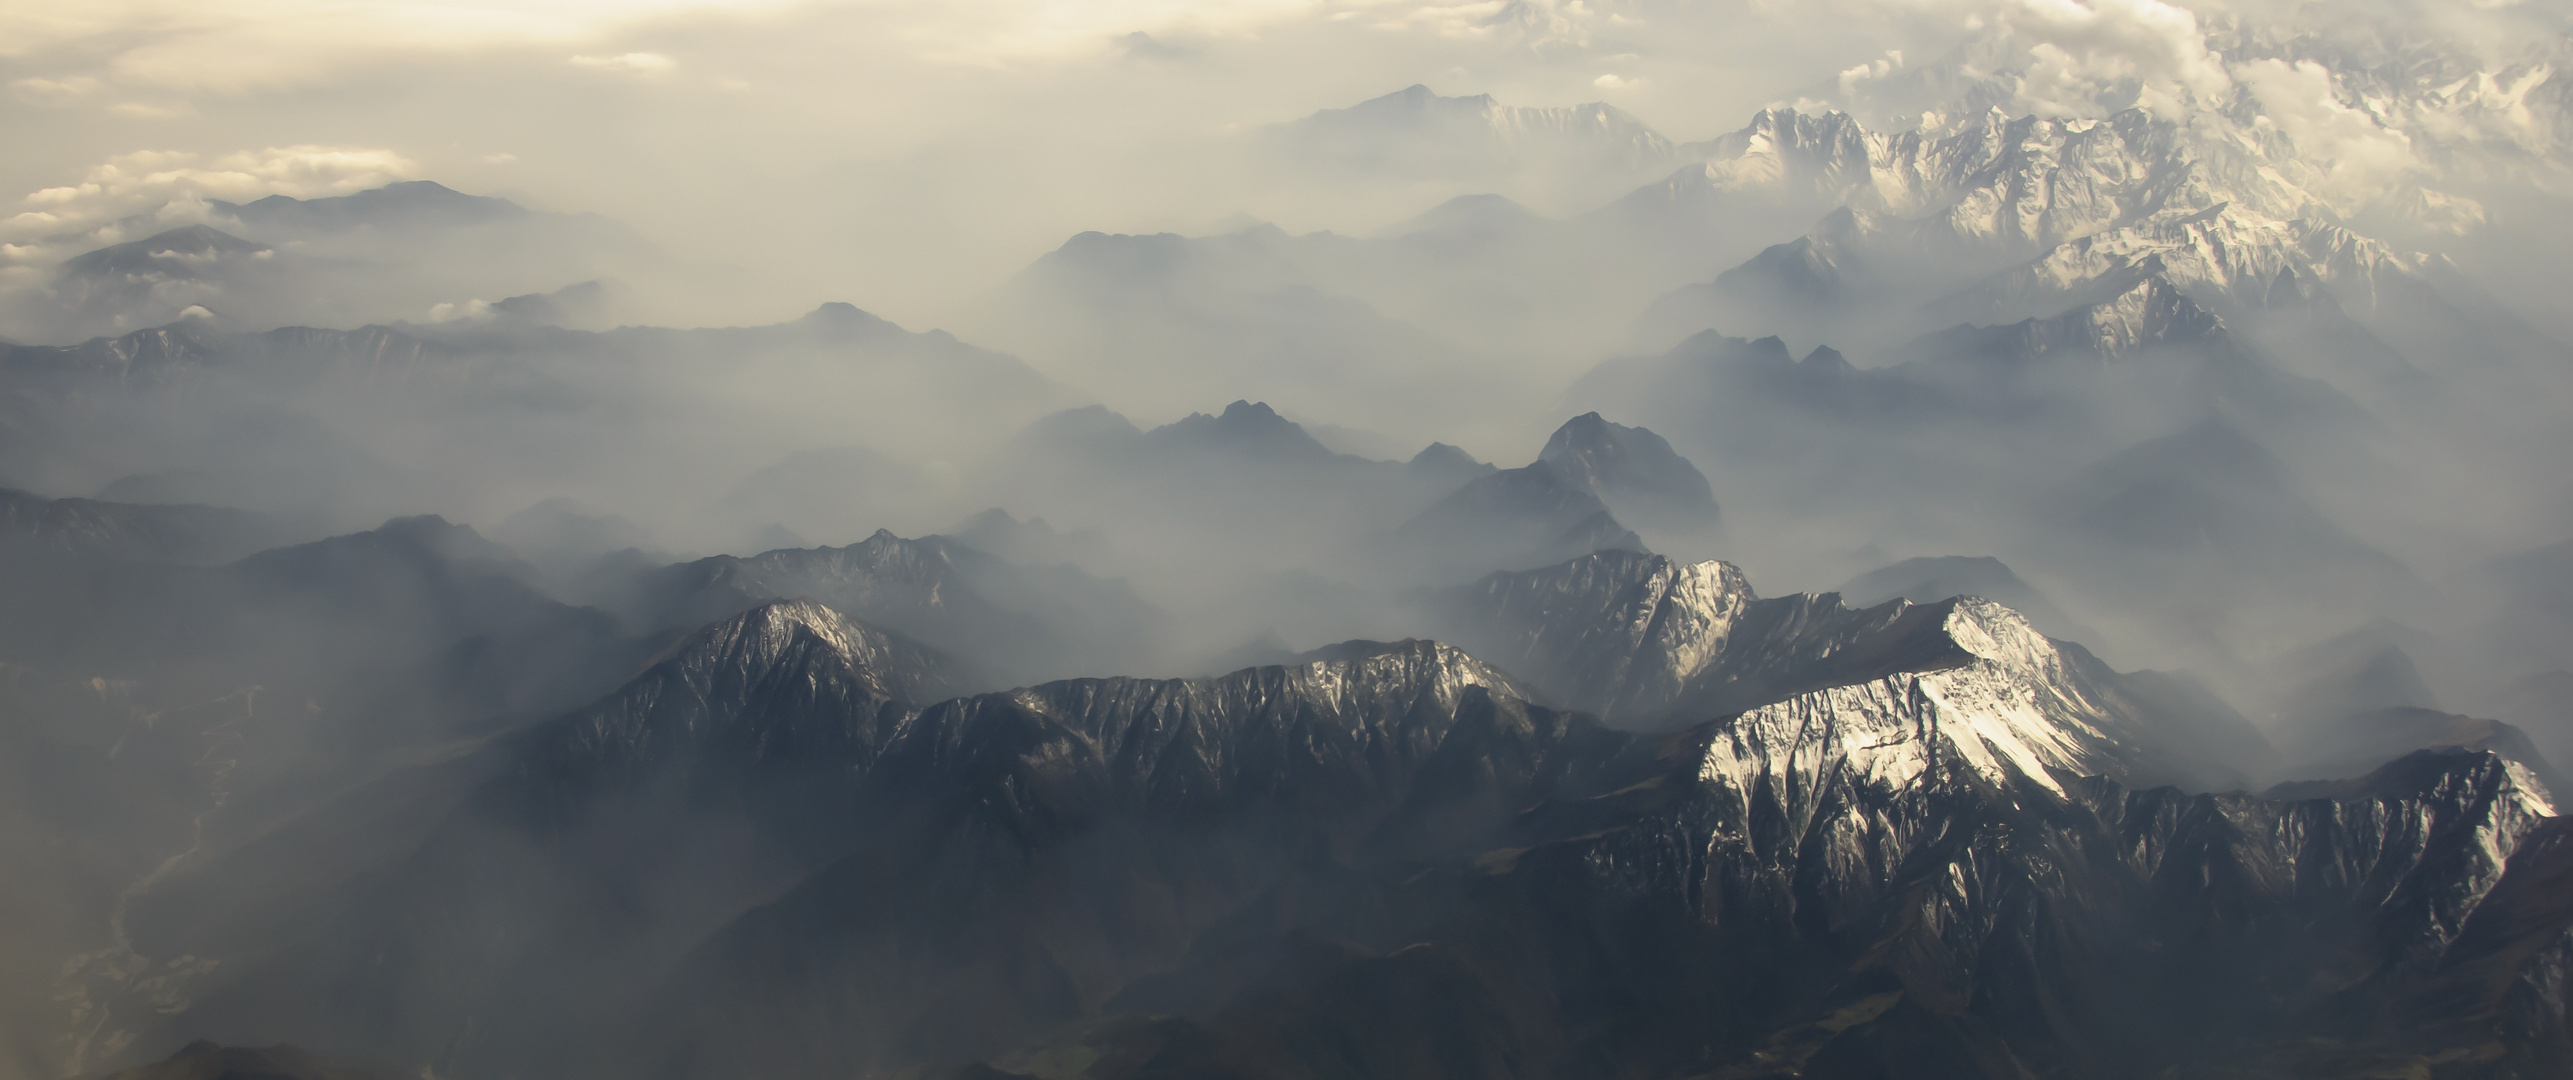 Hoch über dem Himalaya